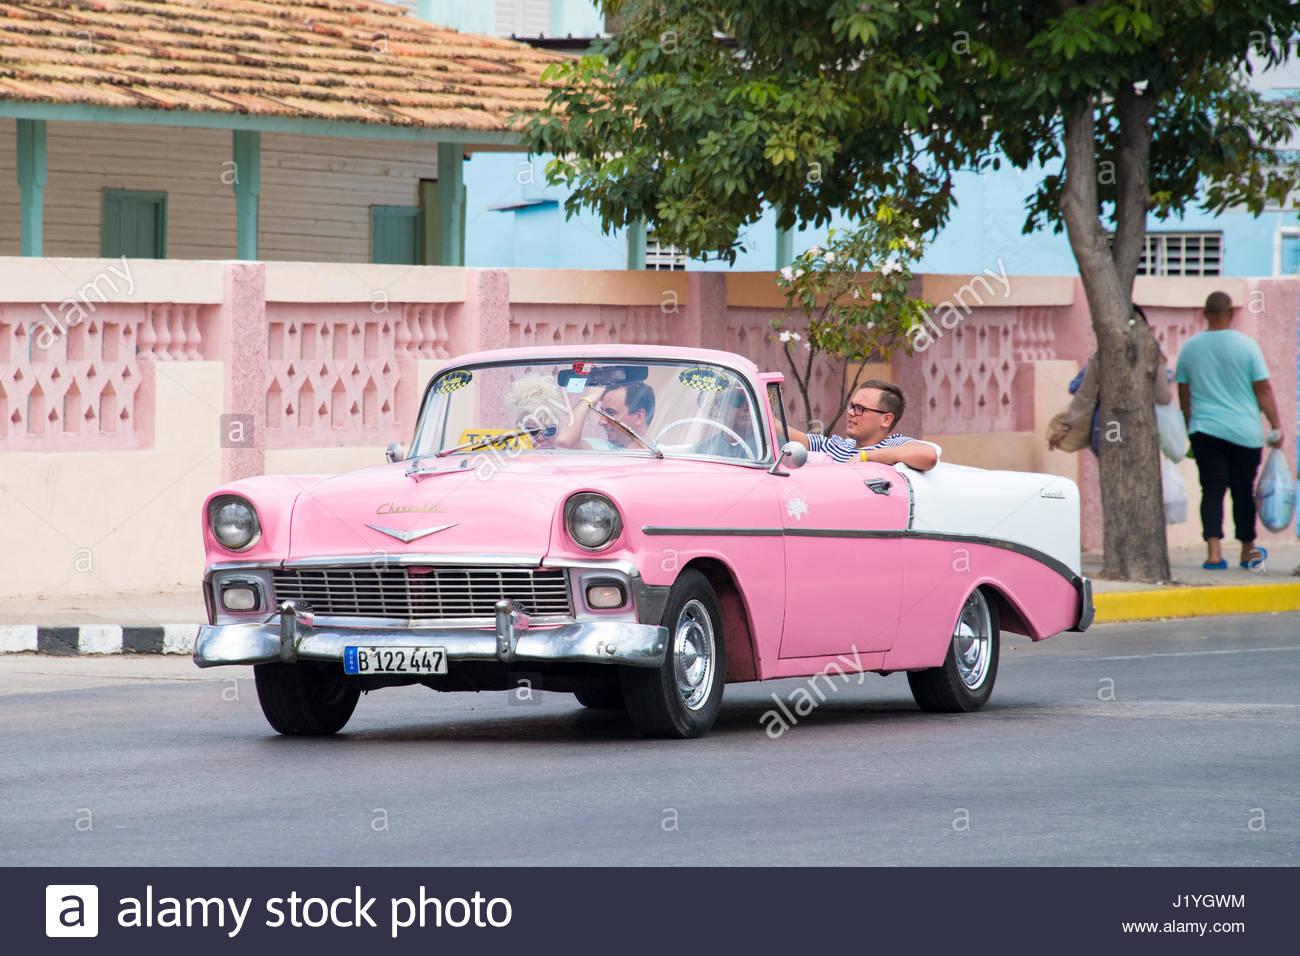 1957 chevrolet cabrio alte amerikanische oldtimer fahren. Black Bedroom Furniture Sets. Home Design Ideas